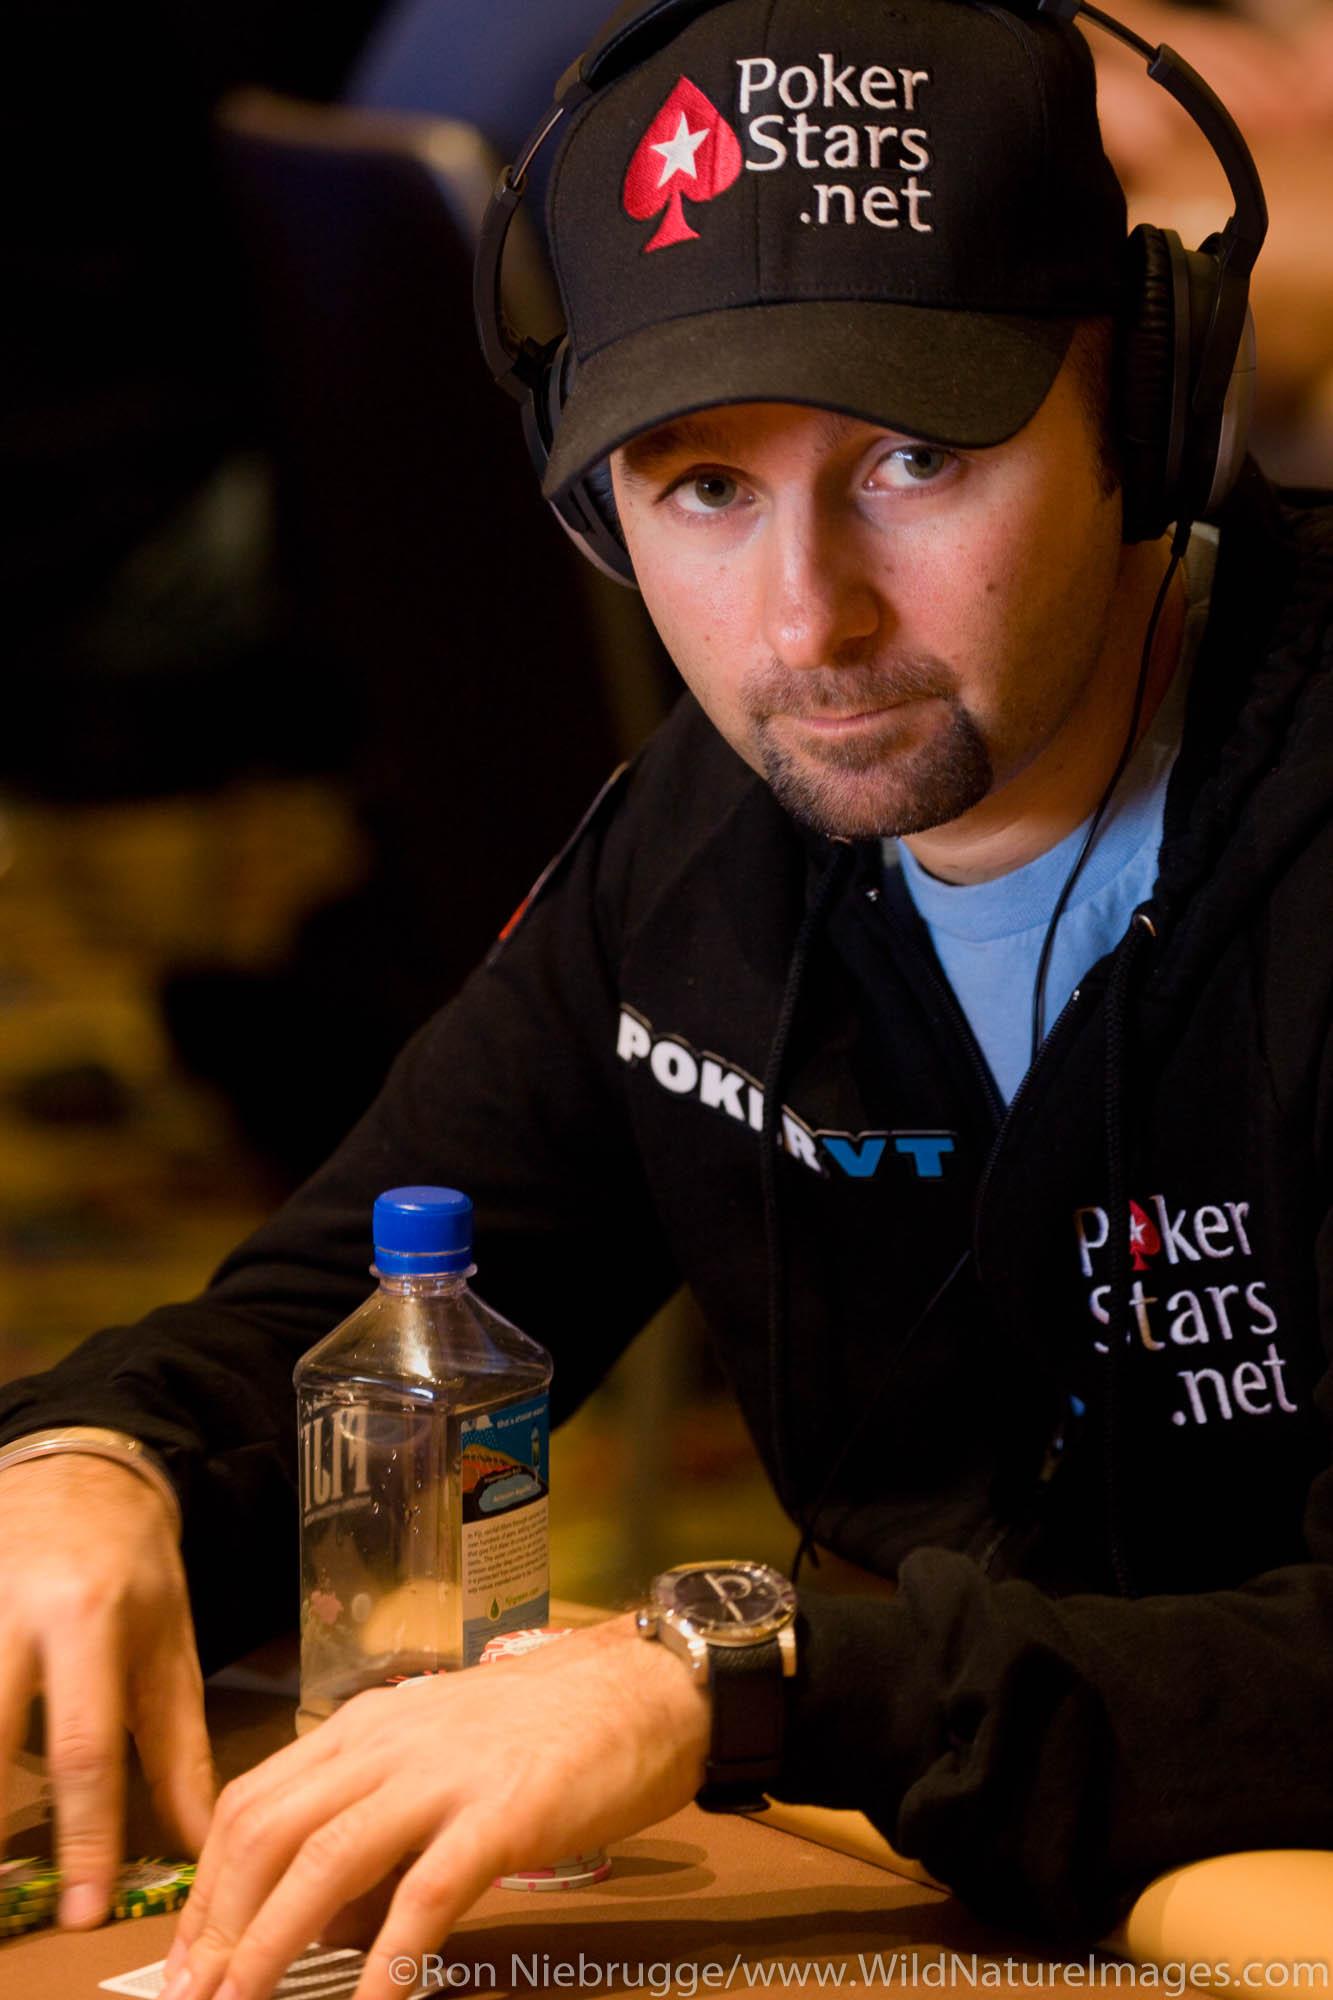 Daniel Negreanu at the 2008 World Poker Tour Festa Al Lago poker tournament at the Bellagio Resort and Casino, Las Vegas, Nevada...